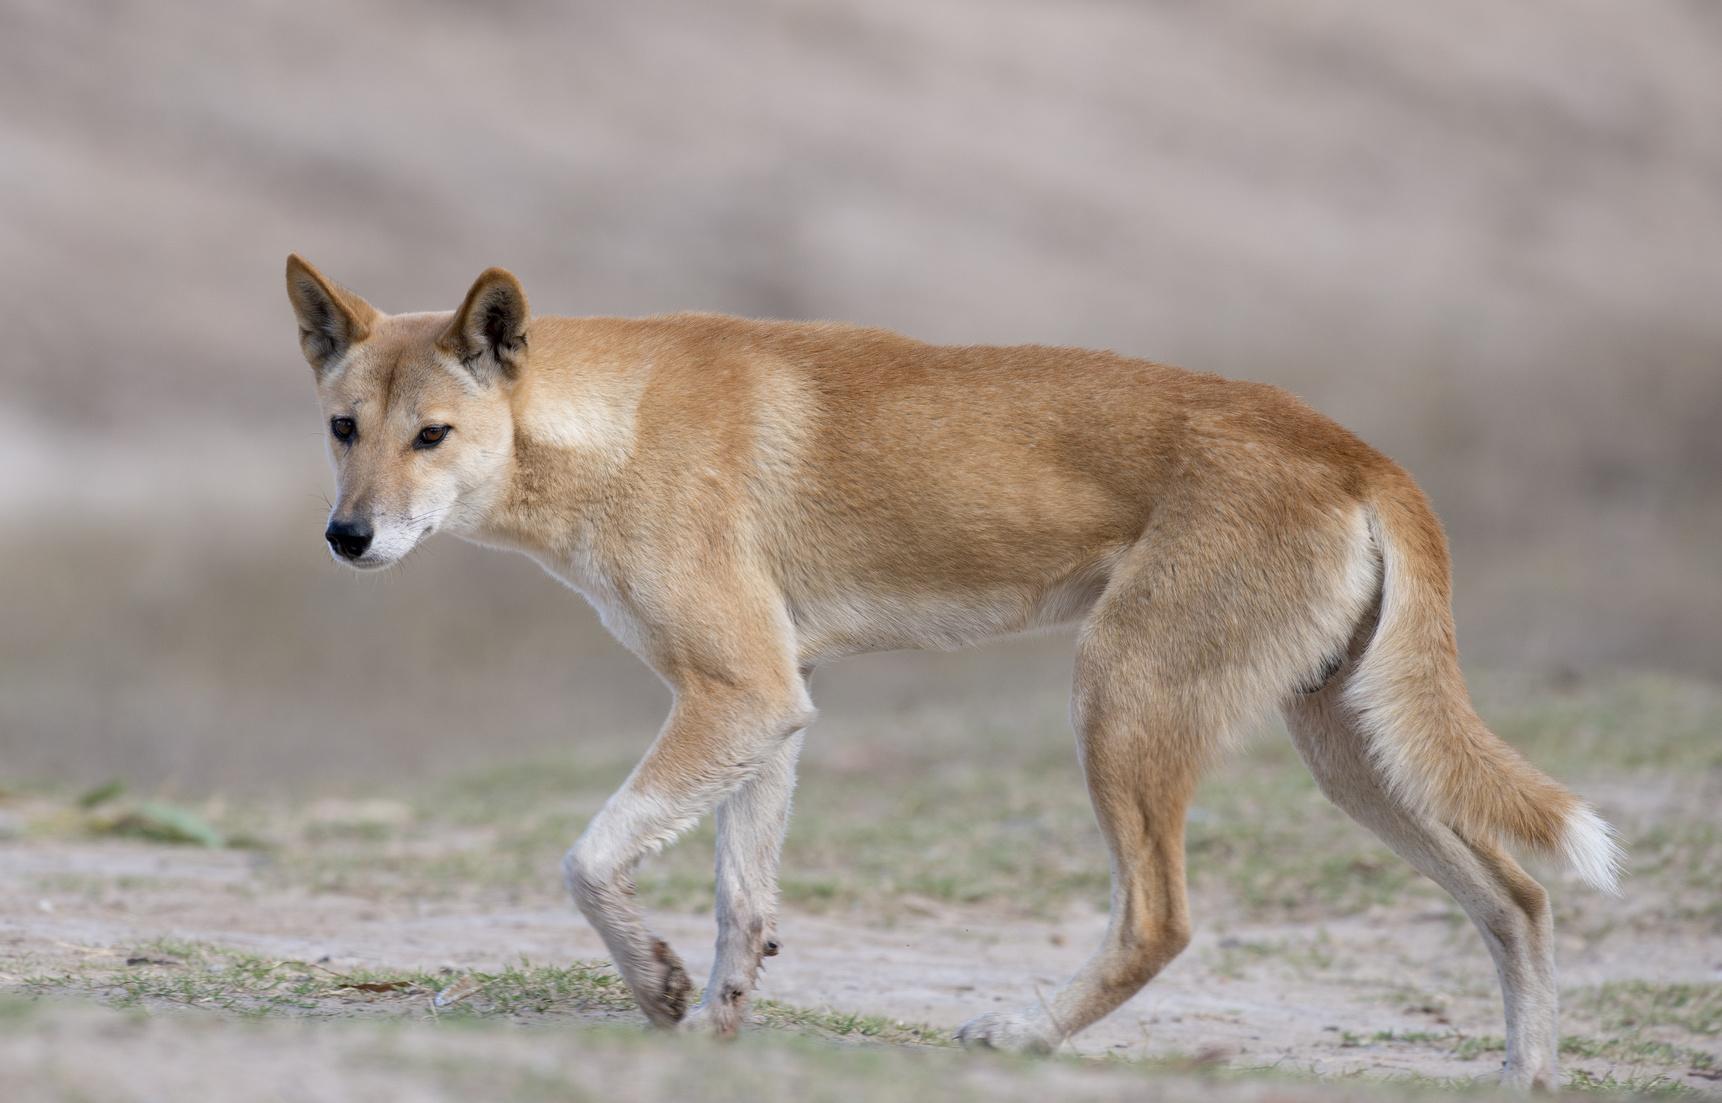 Australian dingo in desert country in outback Queensland, Australia.